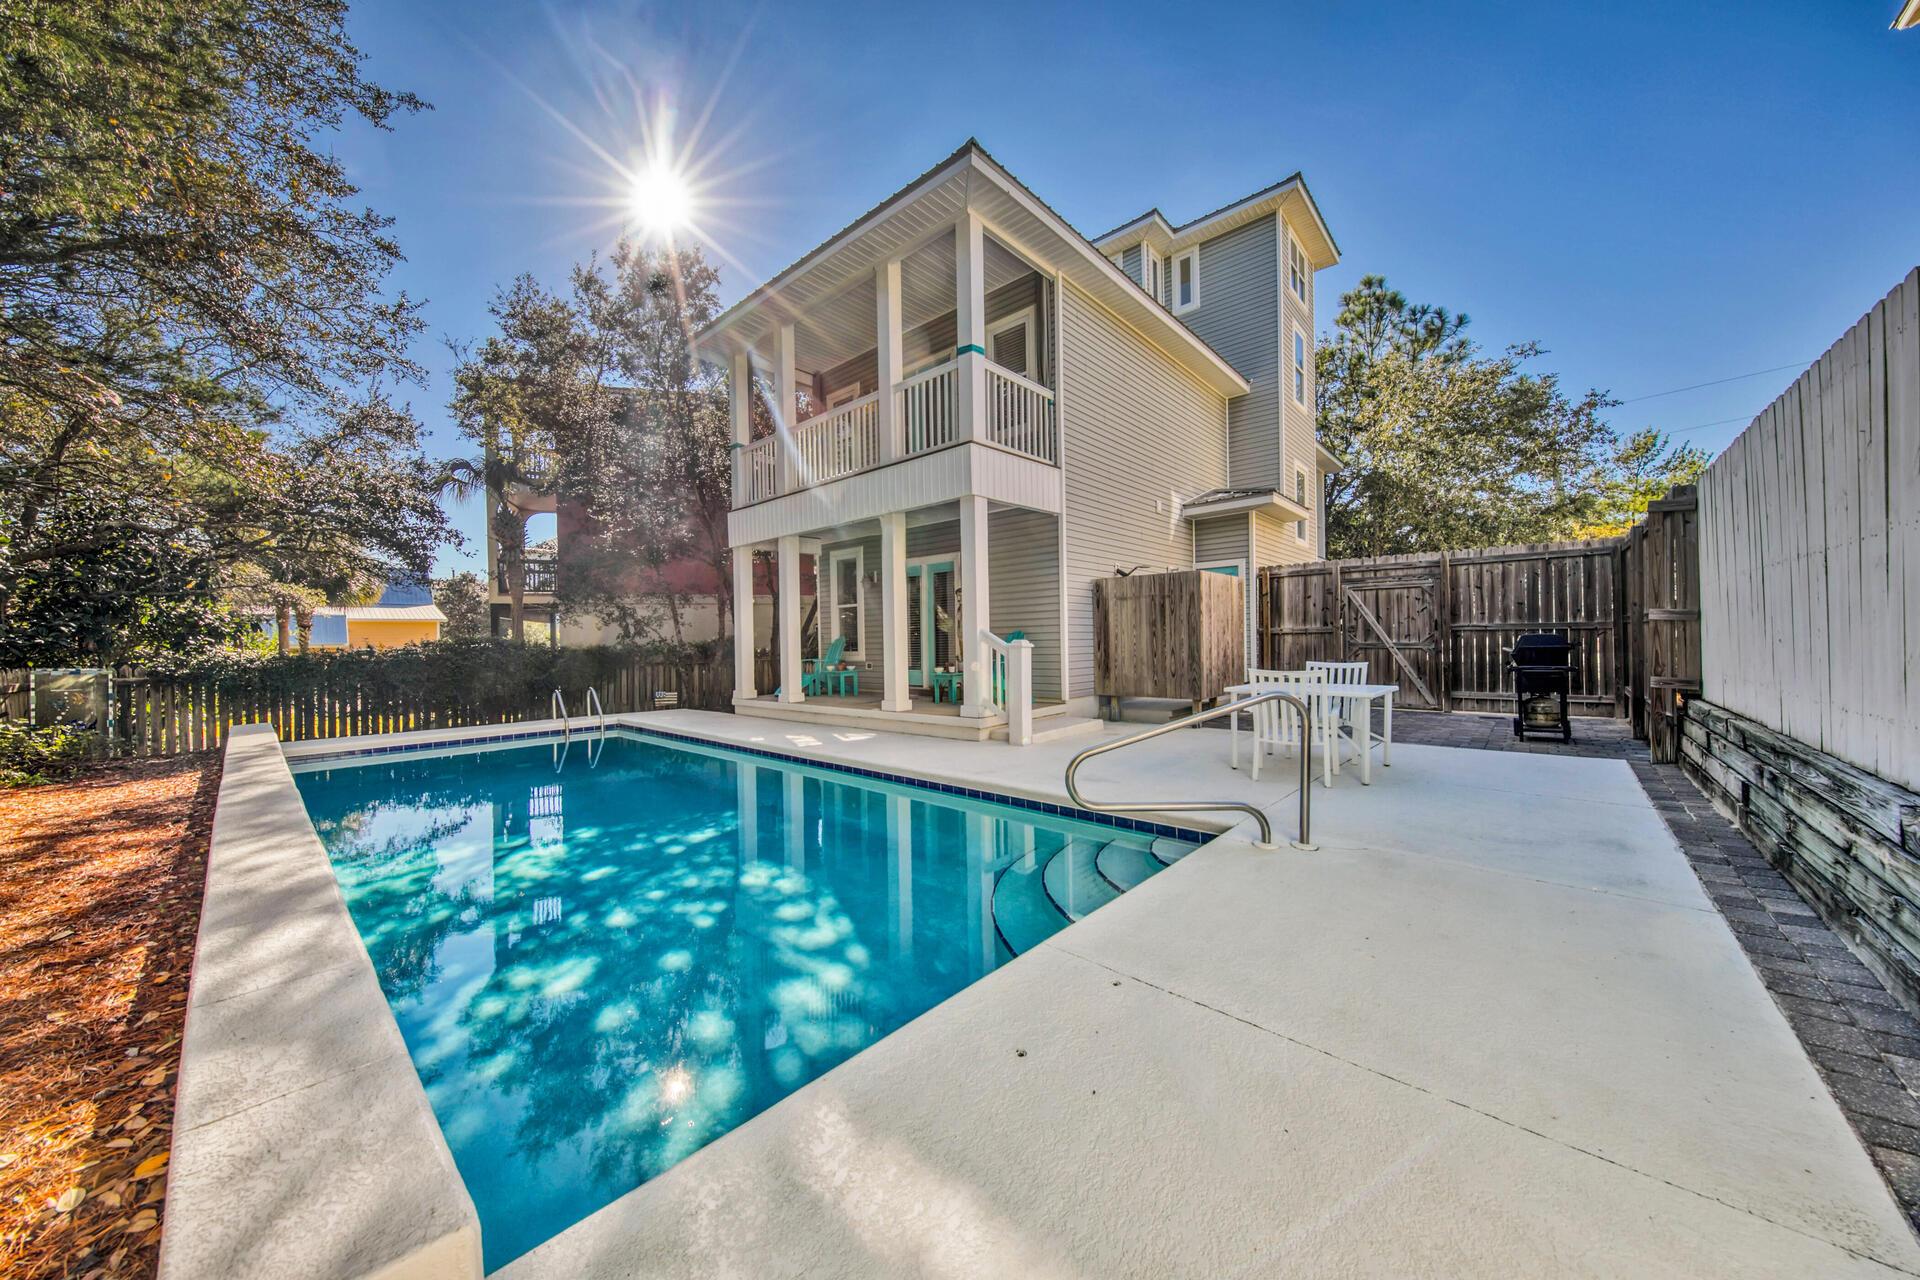 Photo of home for sale at 50 Brown, Santa Rosa Beach FL